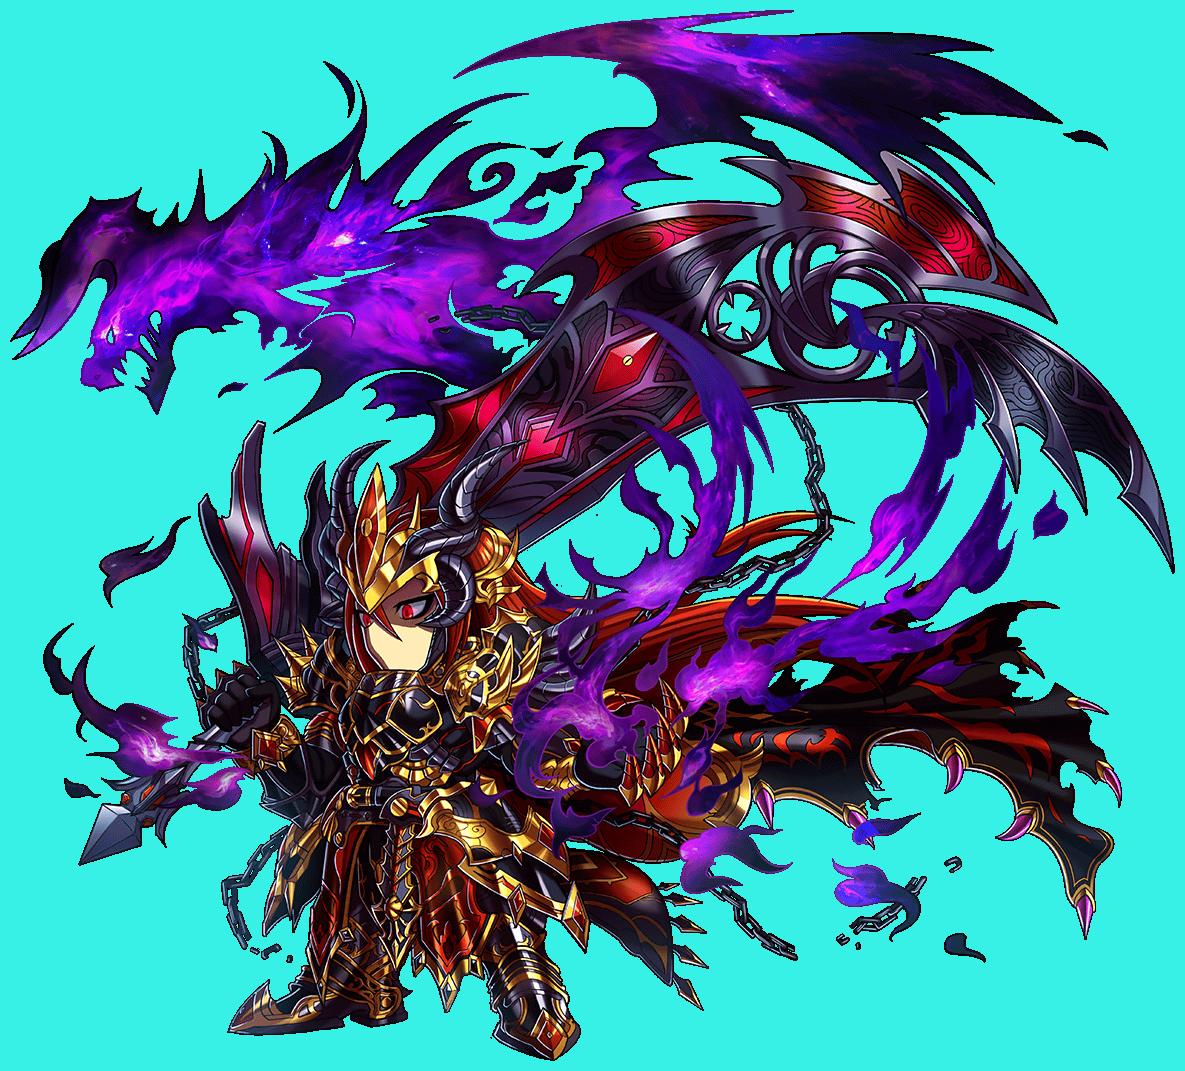 God Emperor Orwen